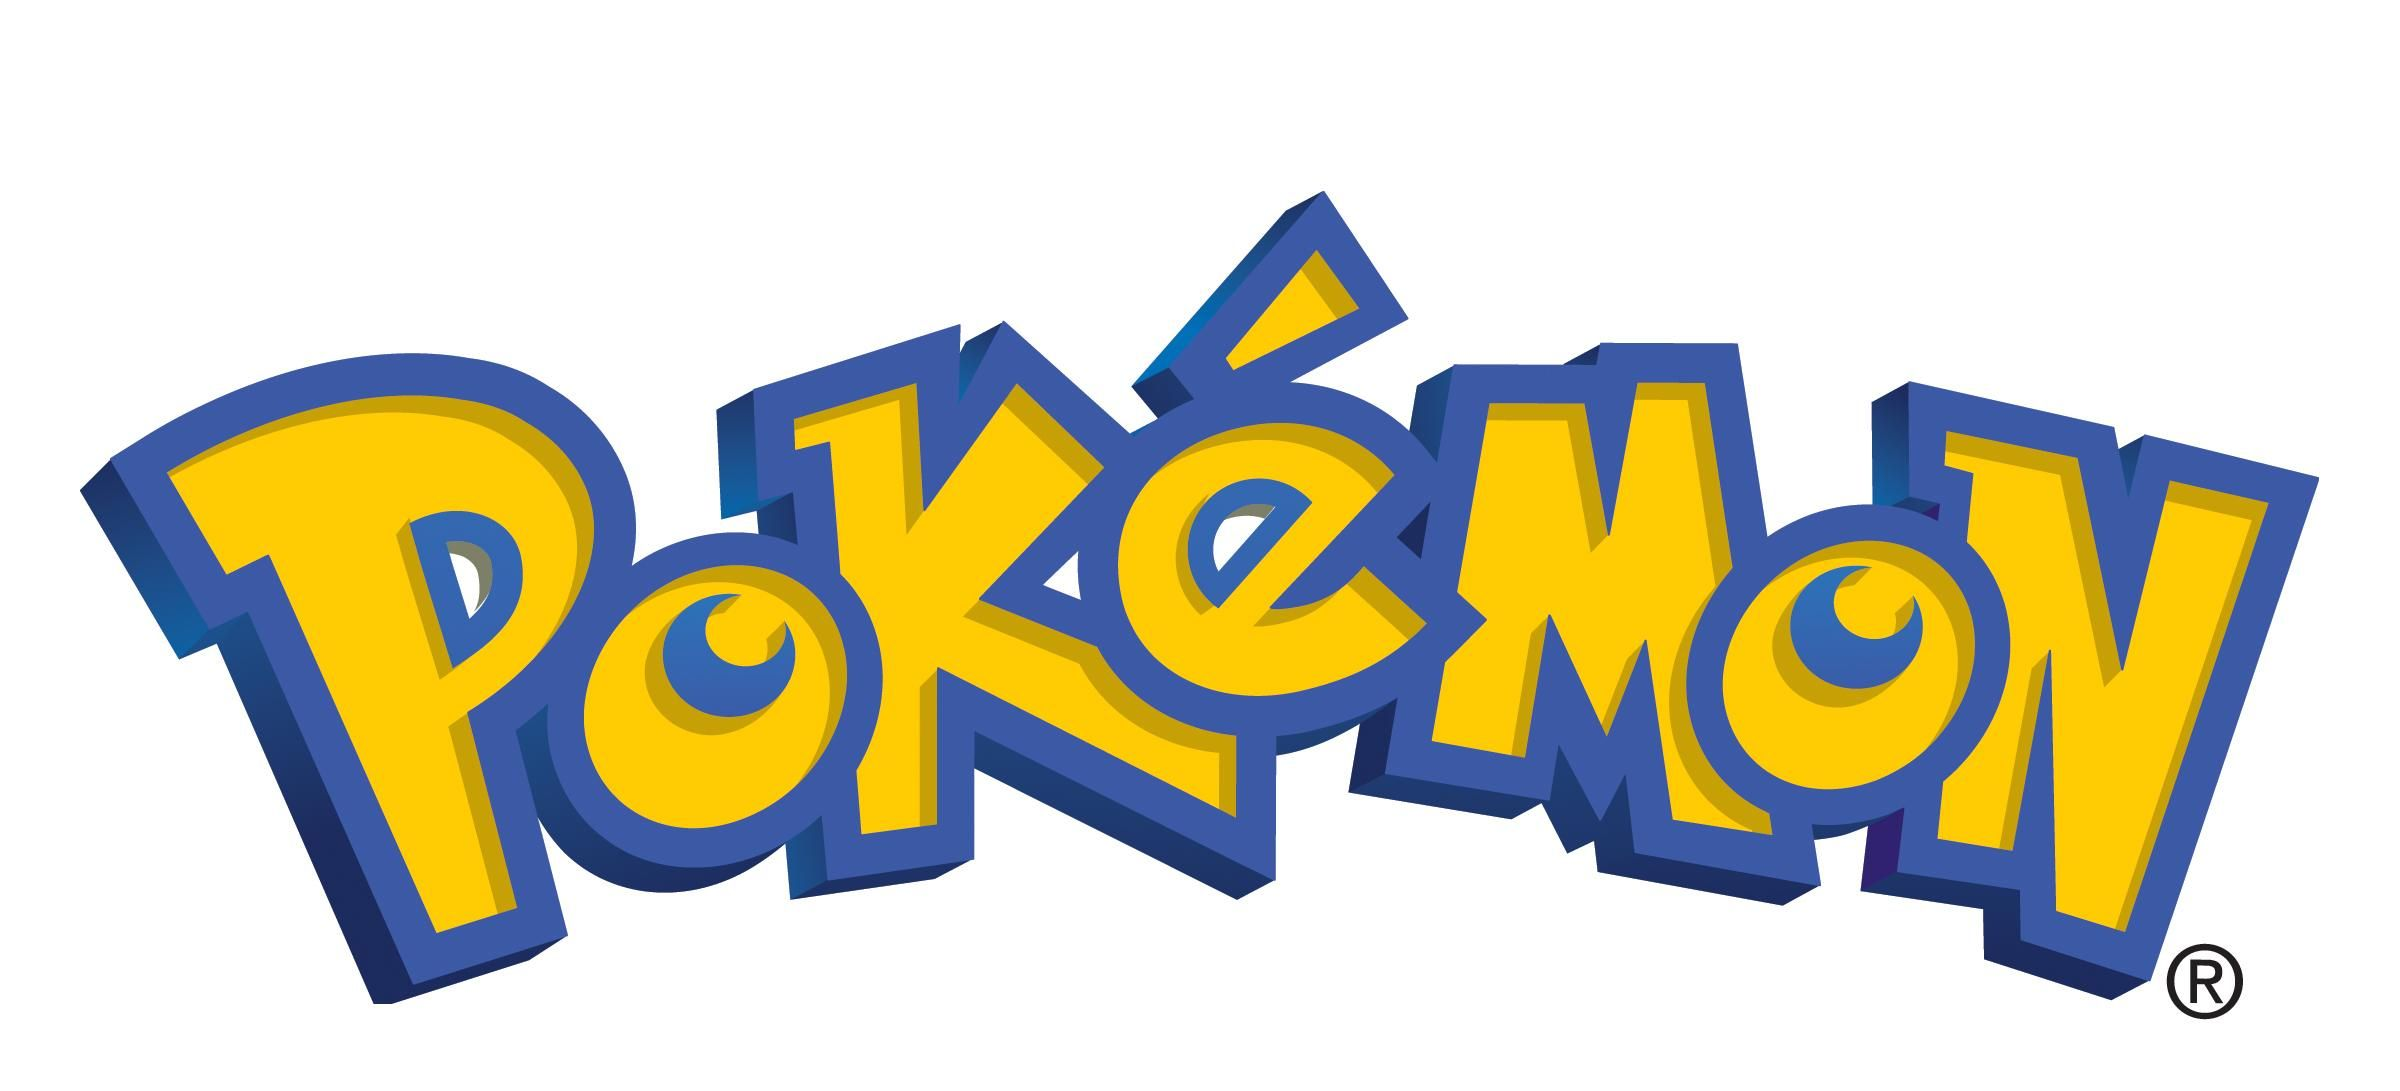 pokemon logo Pokemon logo, Pokemon trading card game